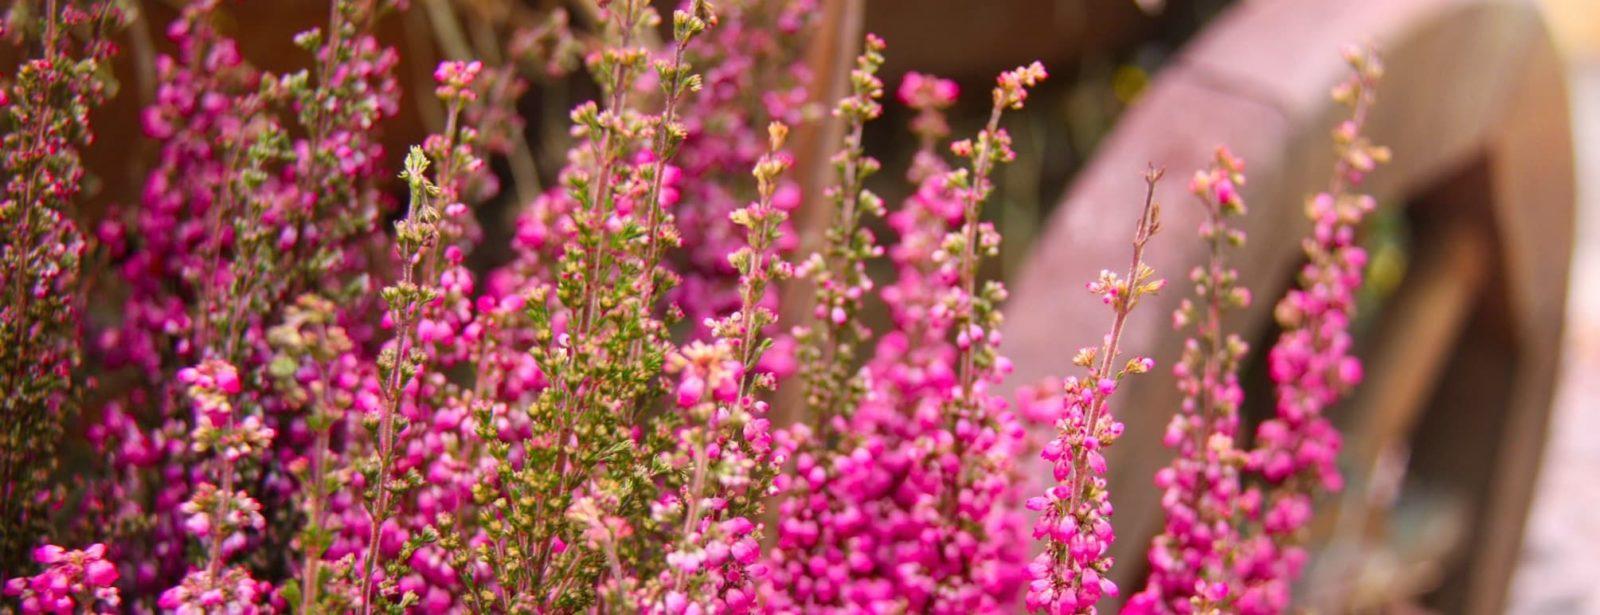 pink Calluna vulgaris heather